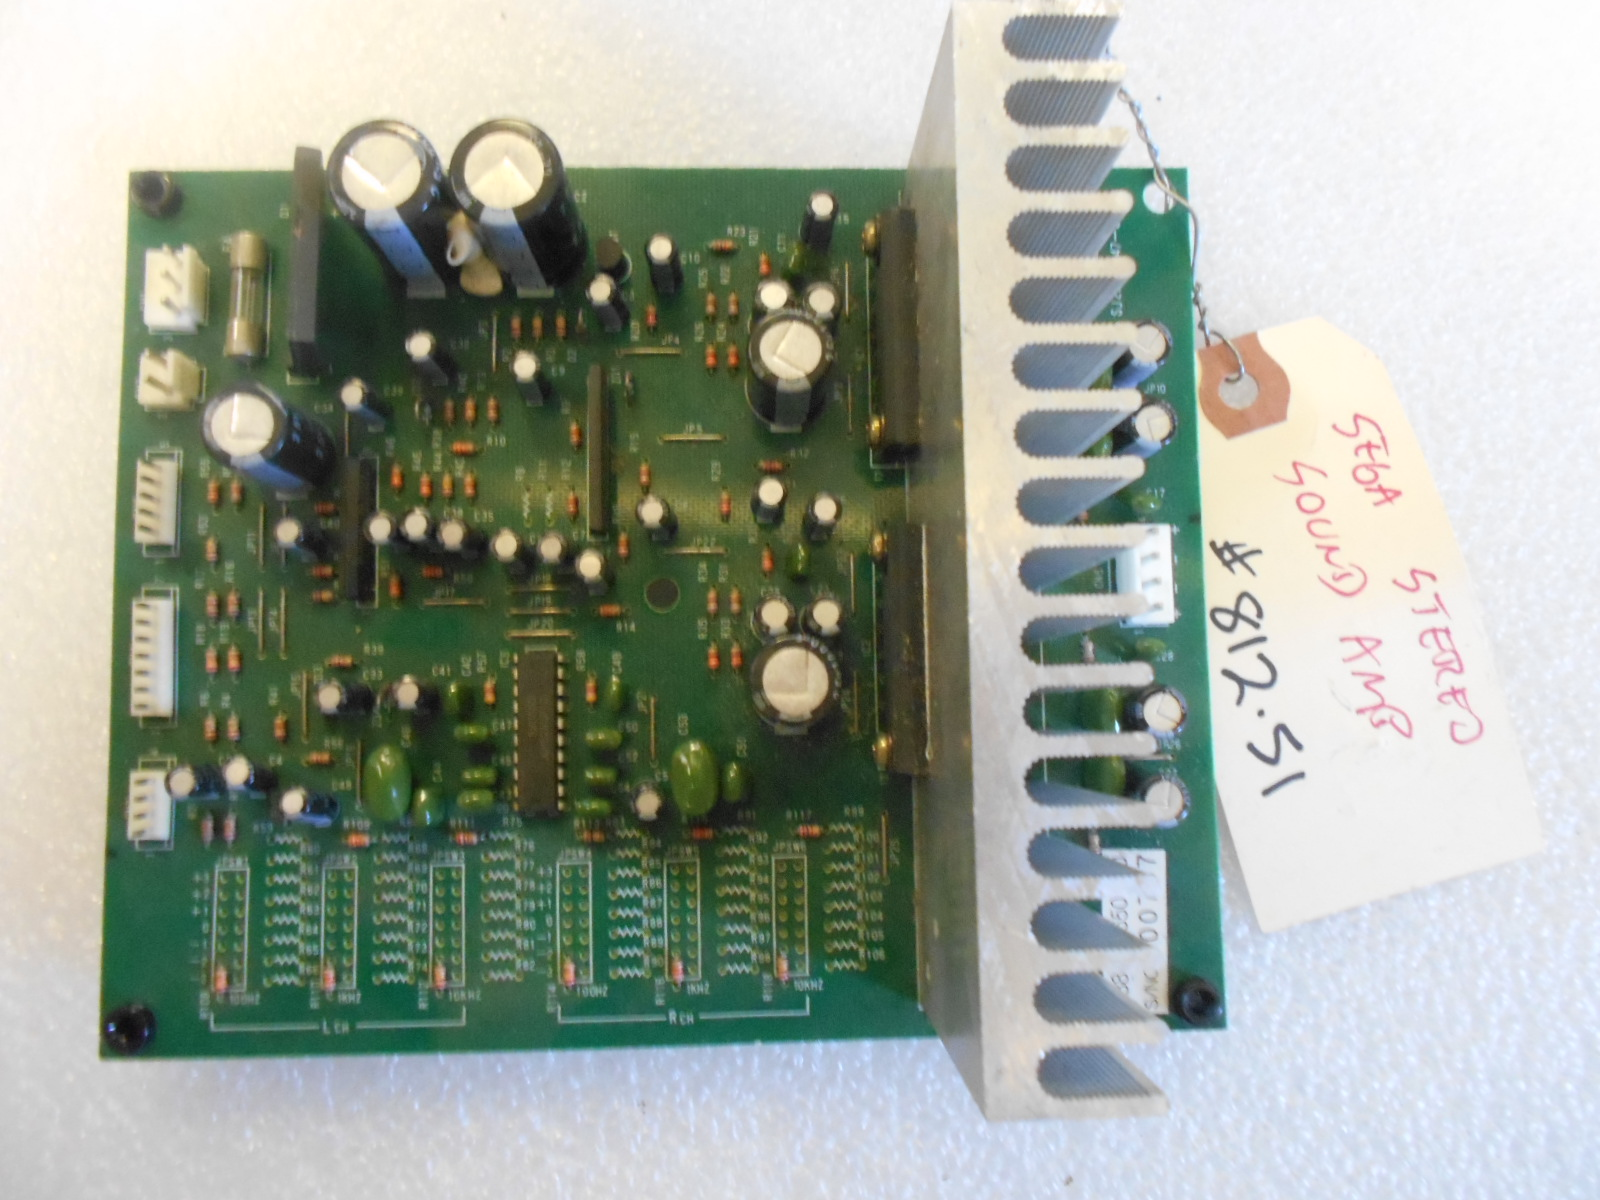 Sega Stereo Sound Amp Arcade Machine Game PCB Printed